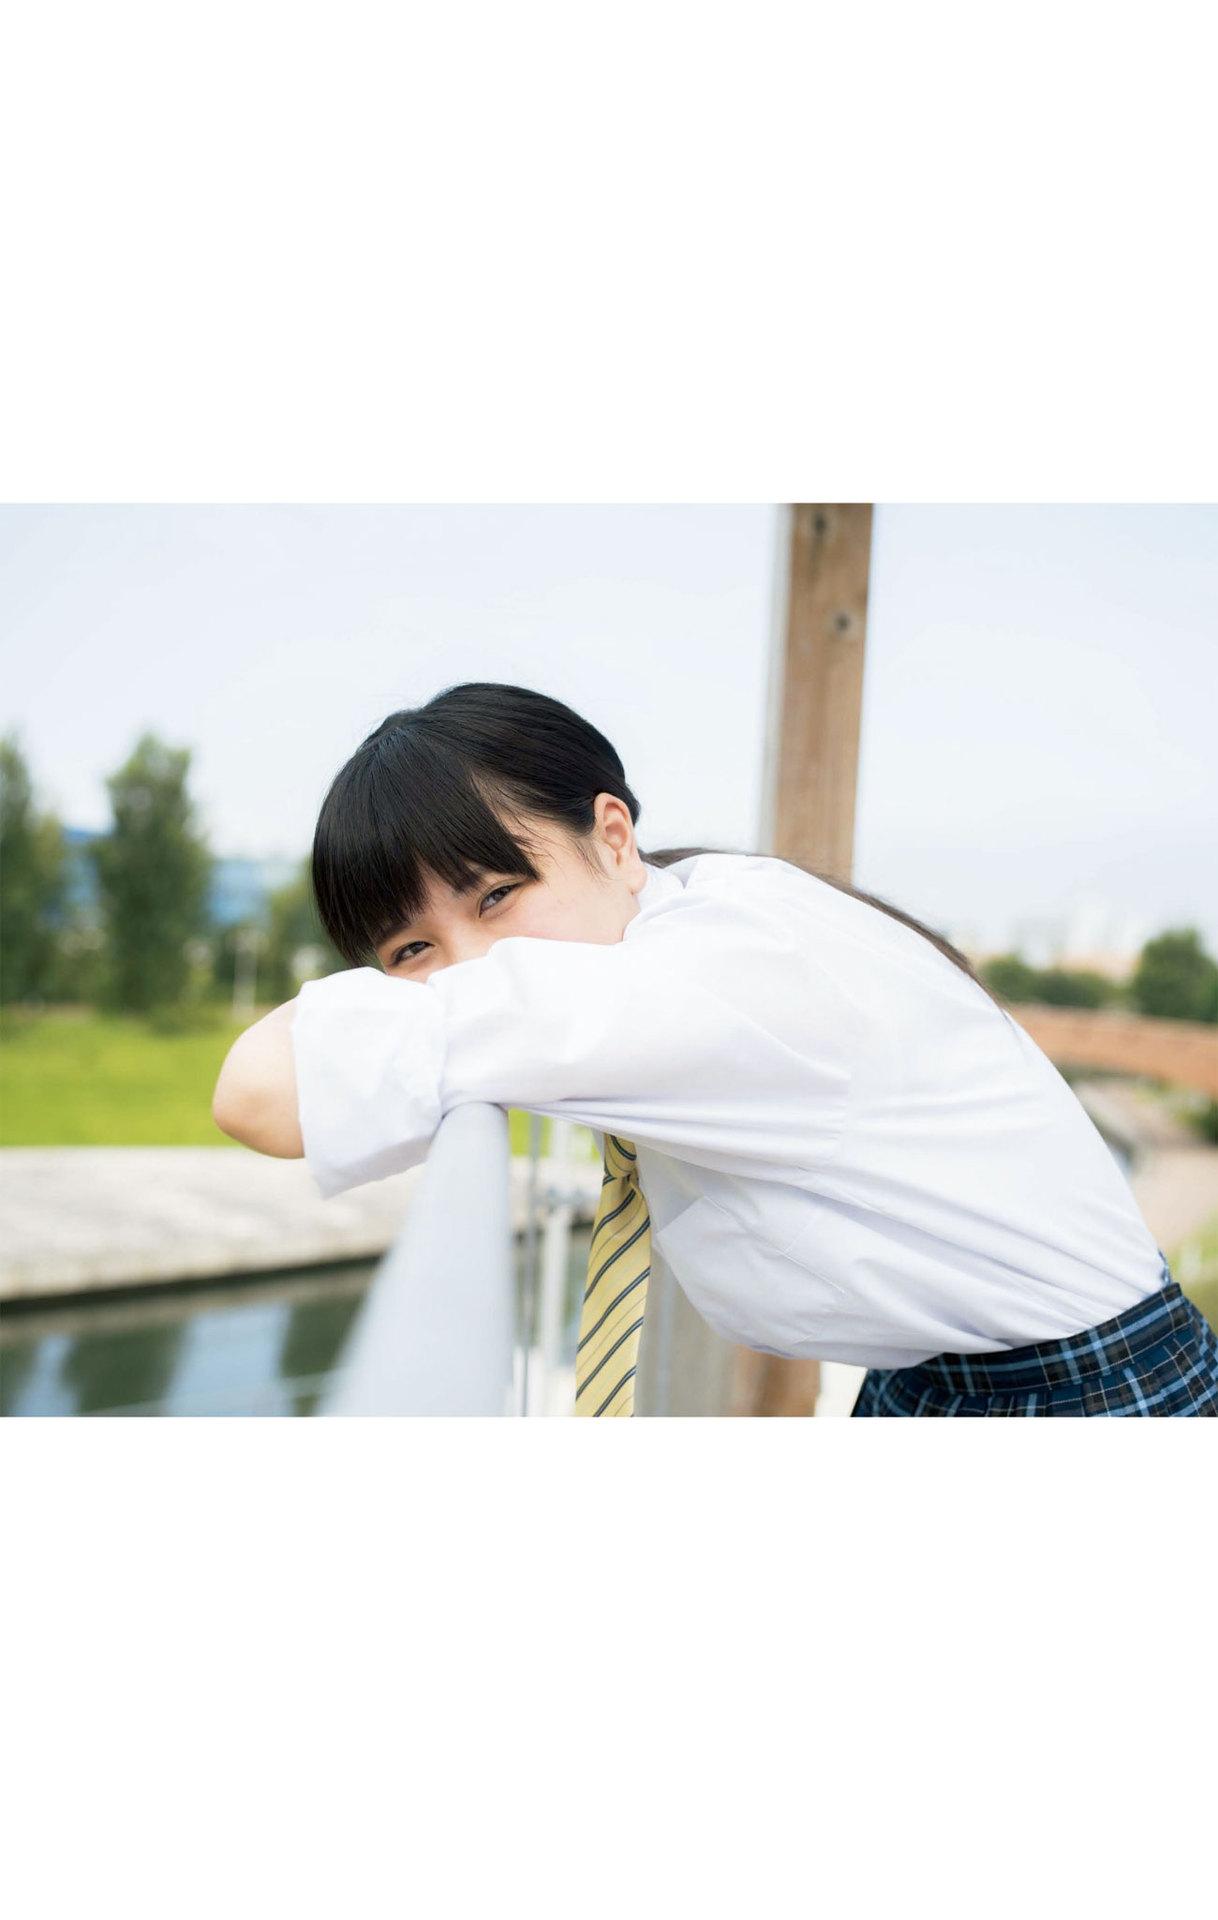 Summer Vacation Uniform After School Youth Bikini034